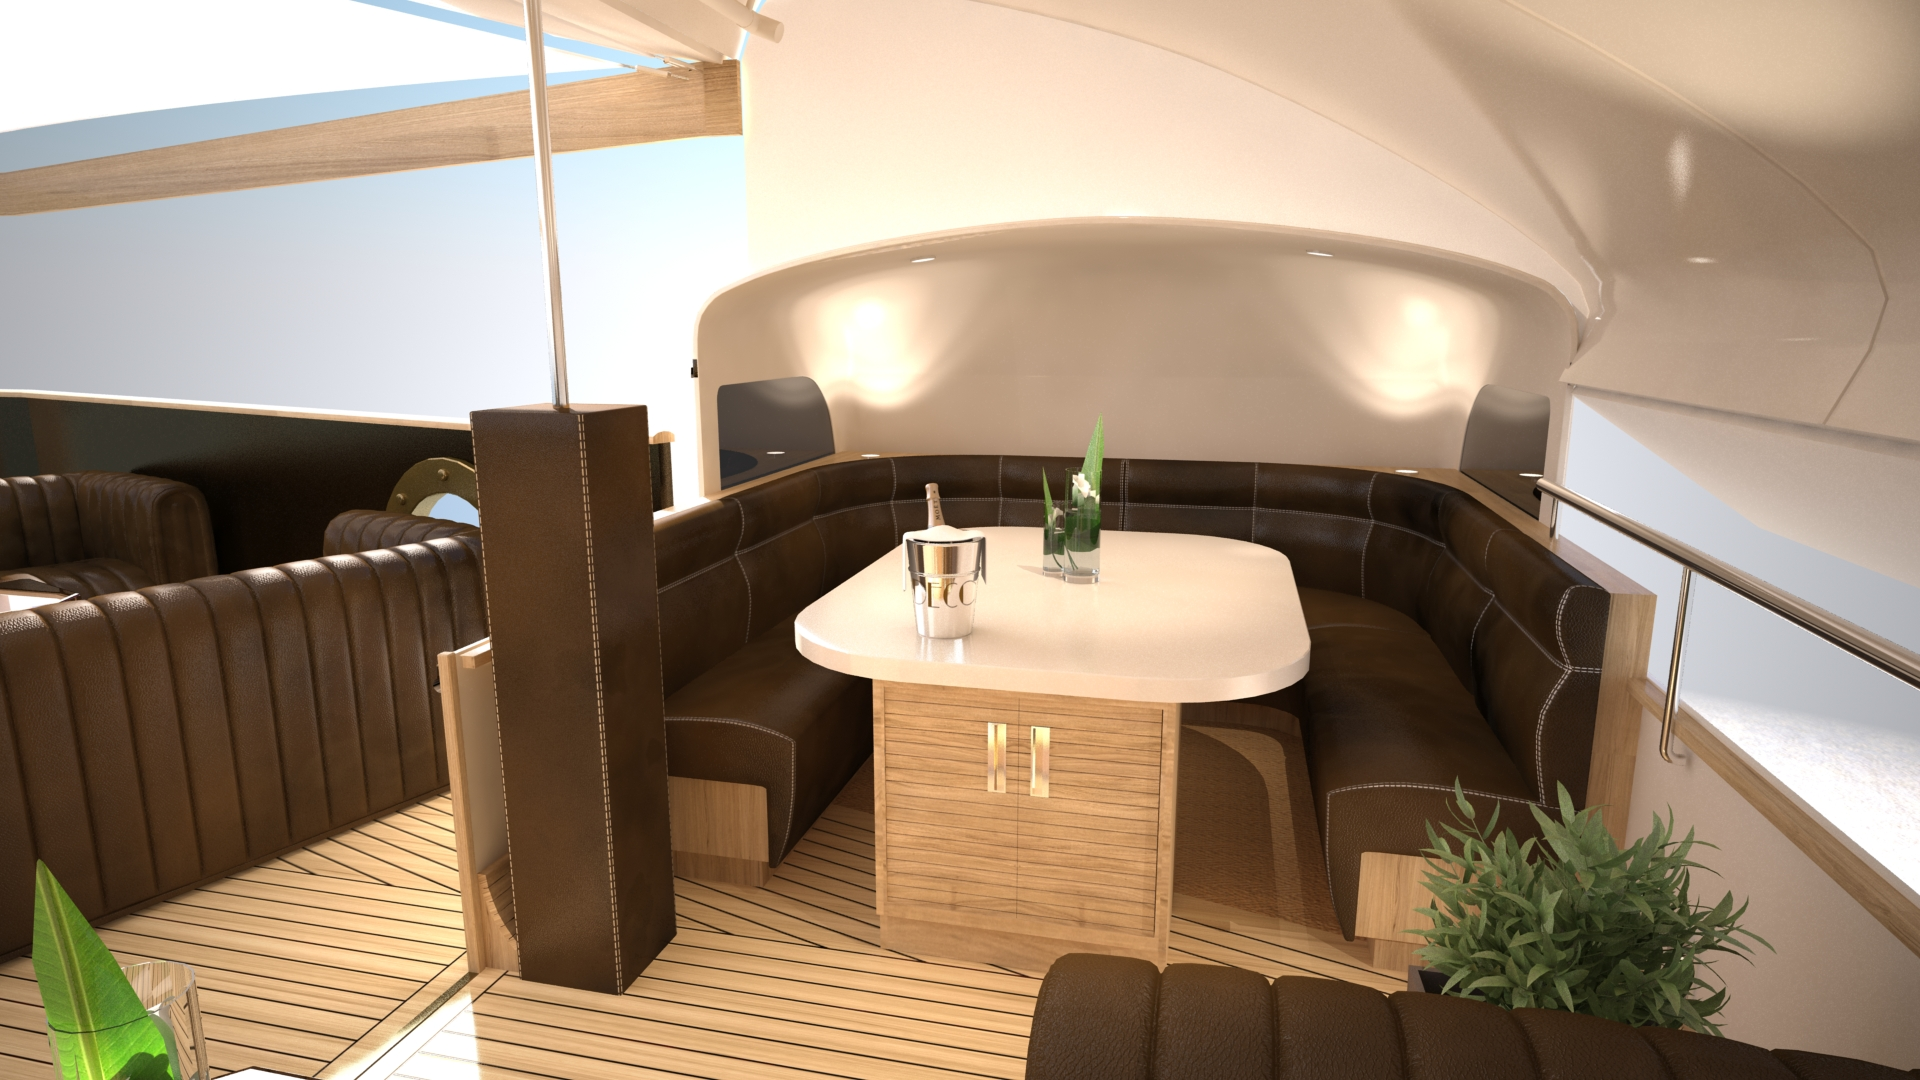 Top Deck Banquette Seats_01.jpg